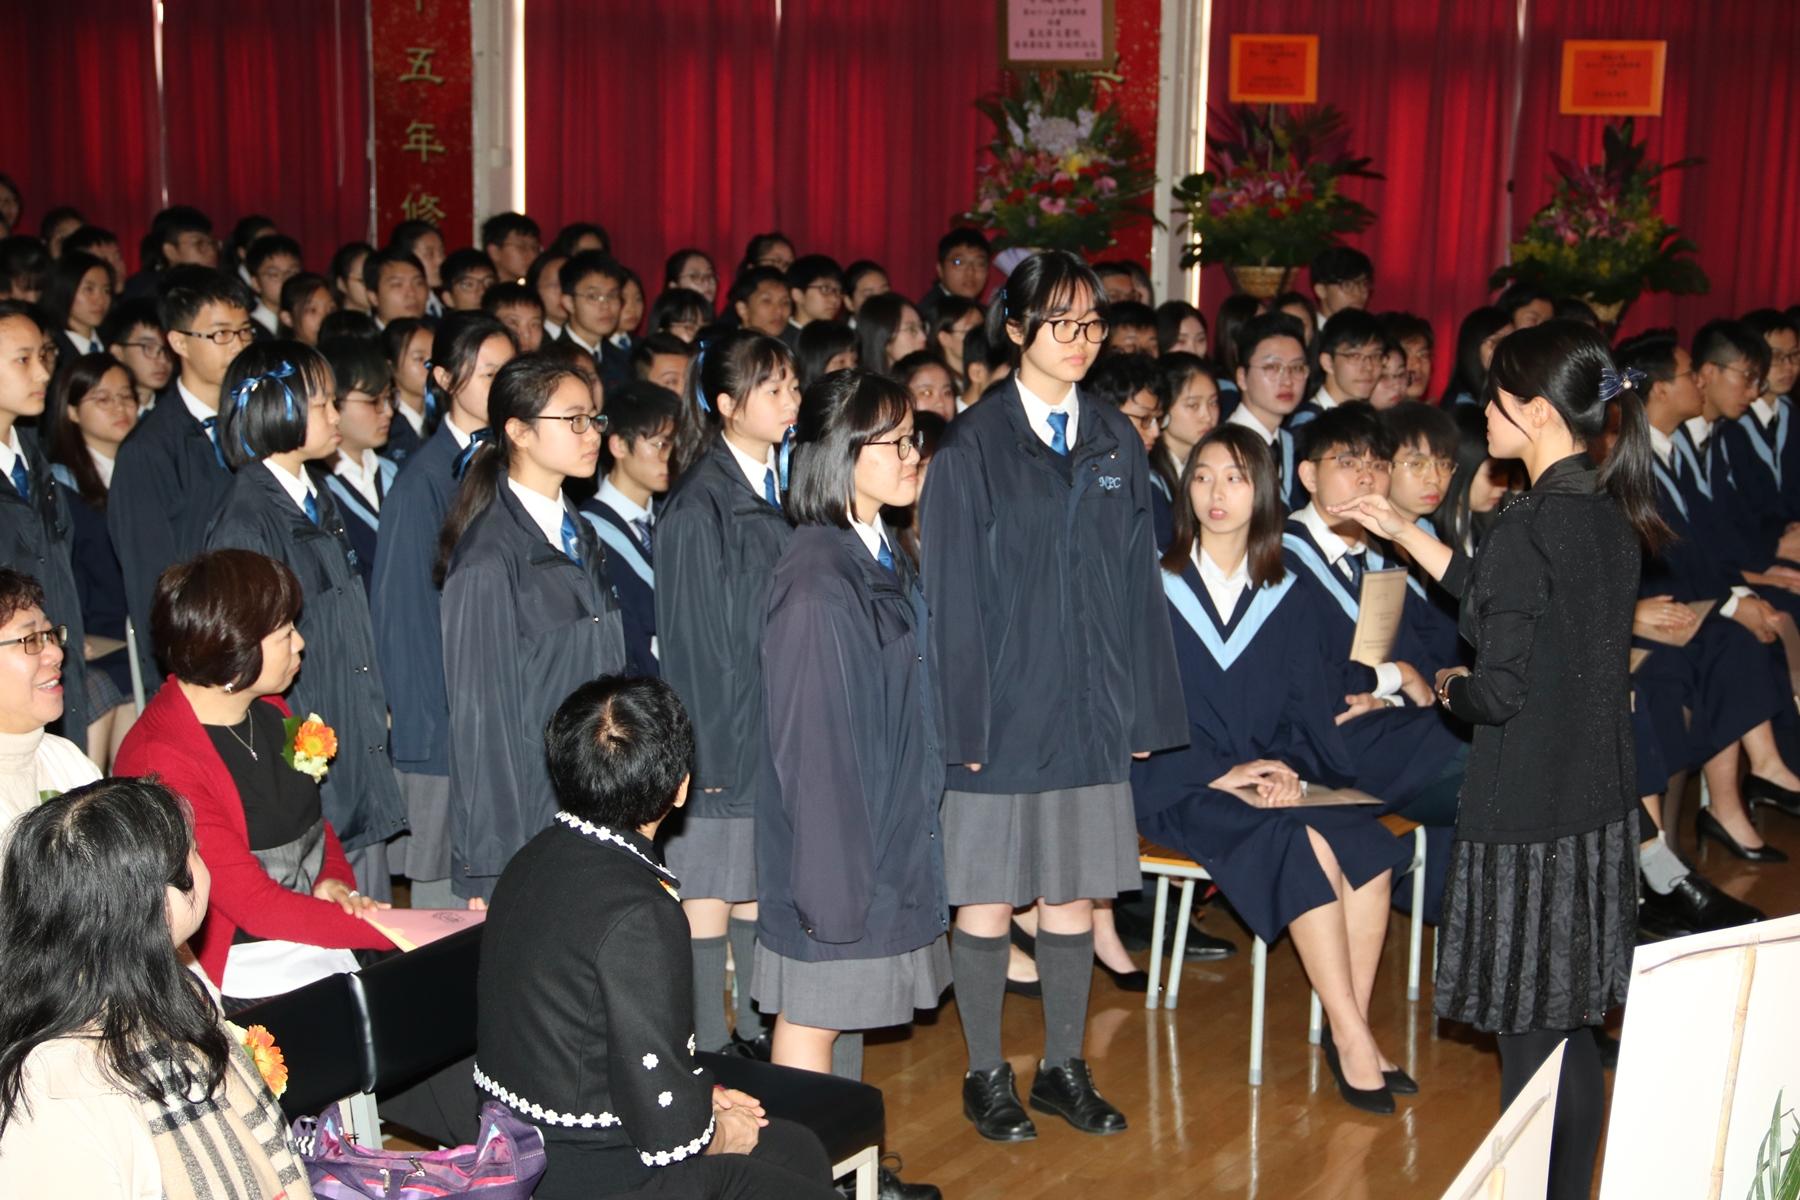 http://npc.edu.hk/sites/default/files/img_7087.jpg